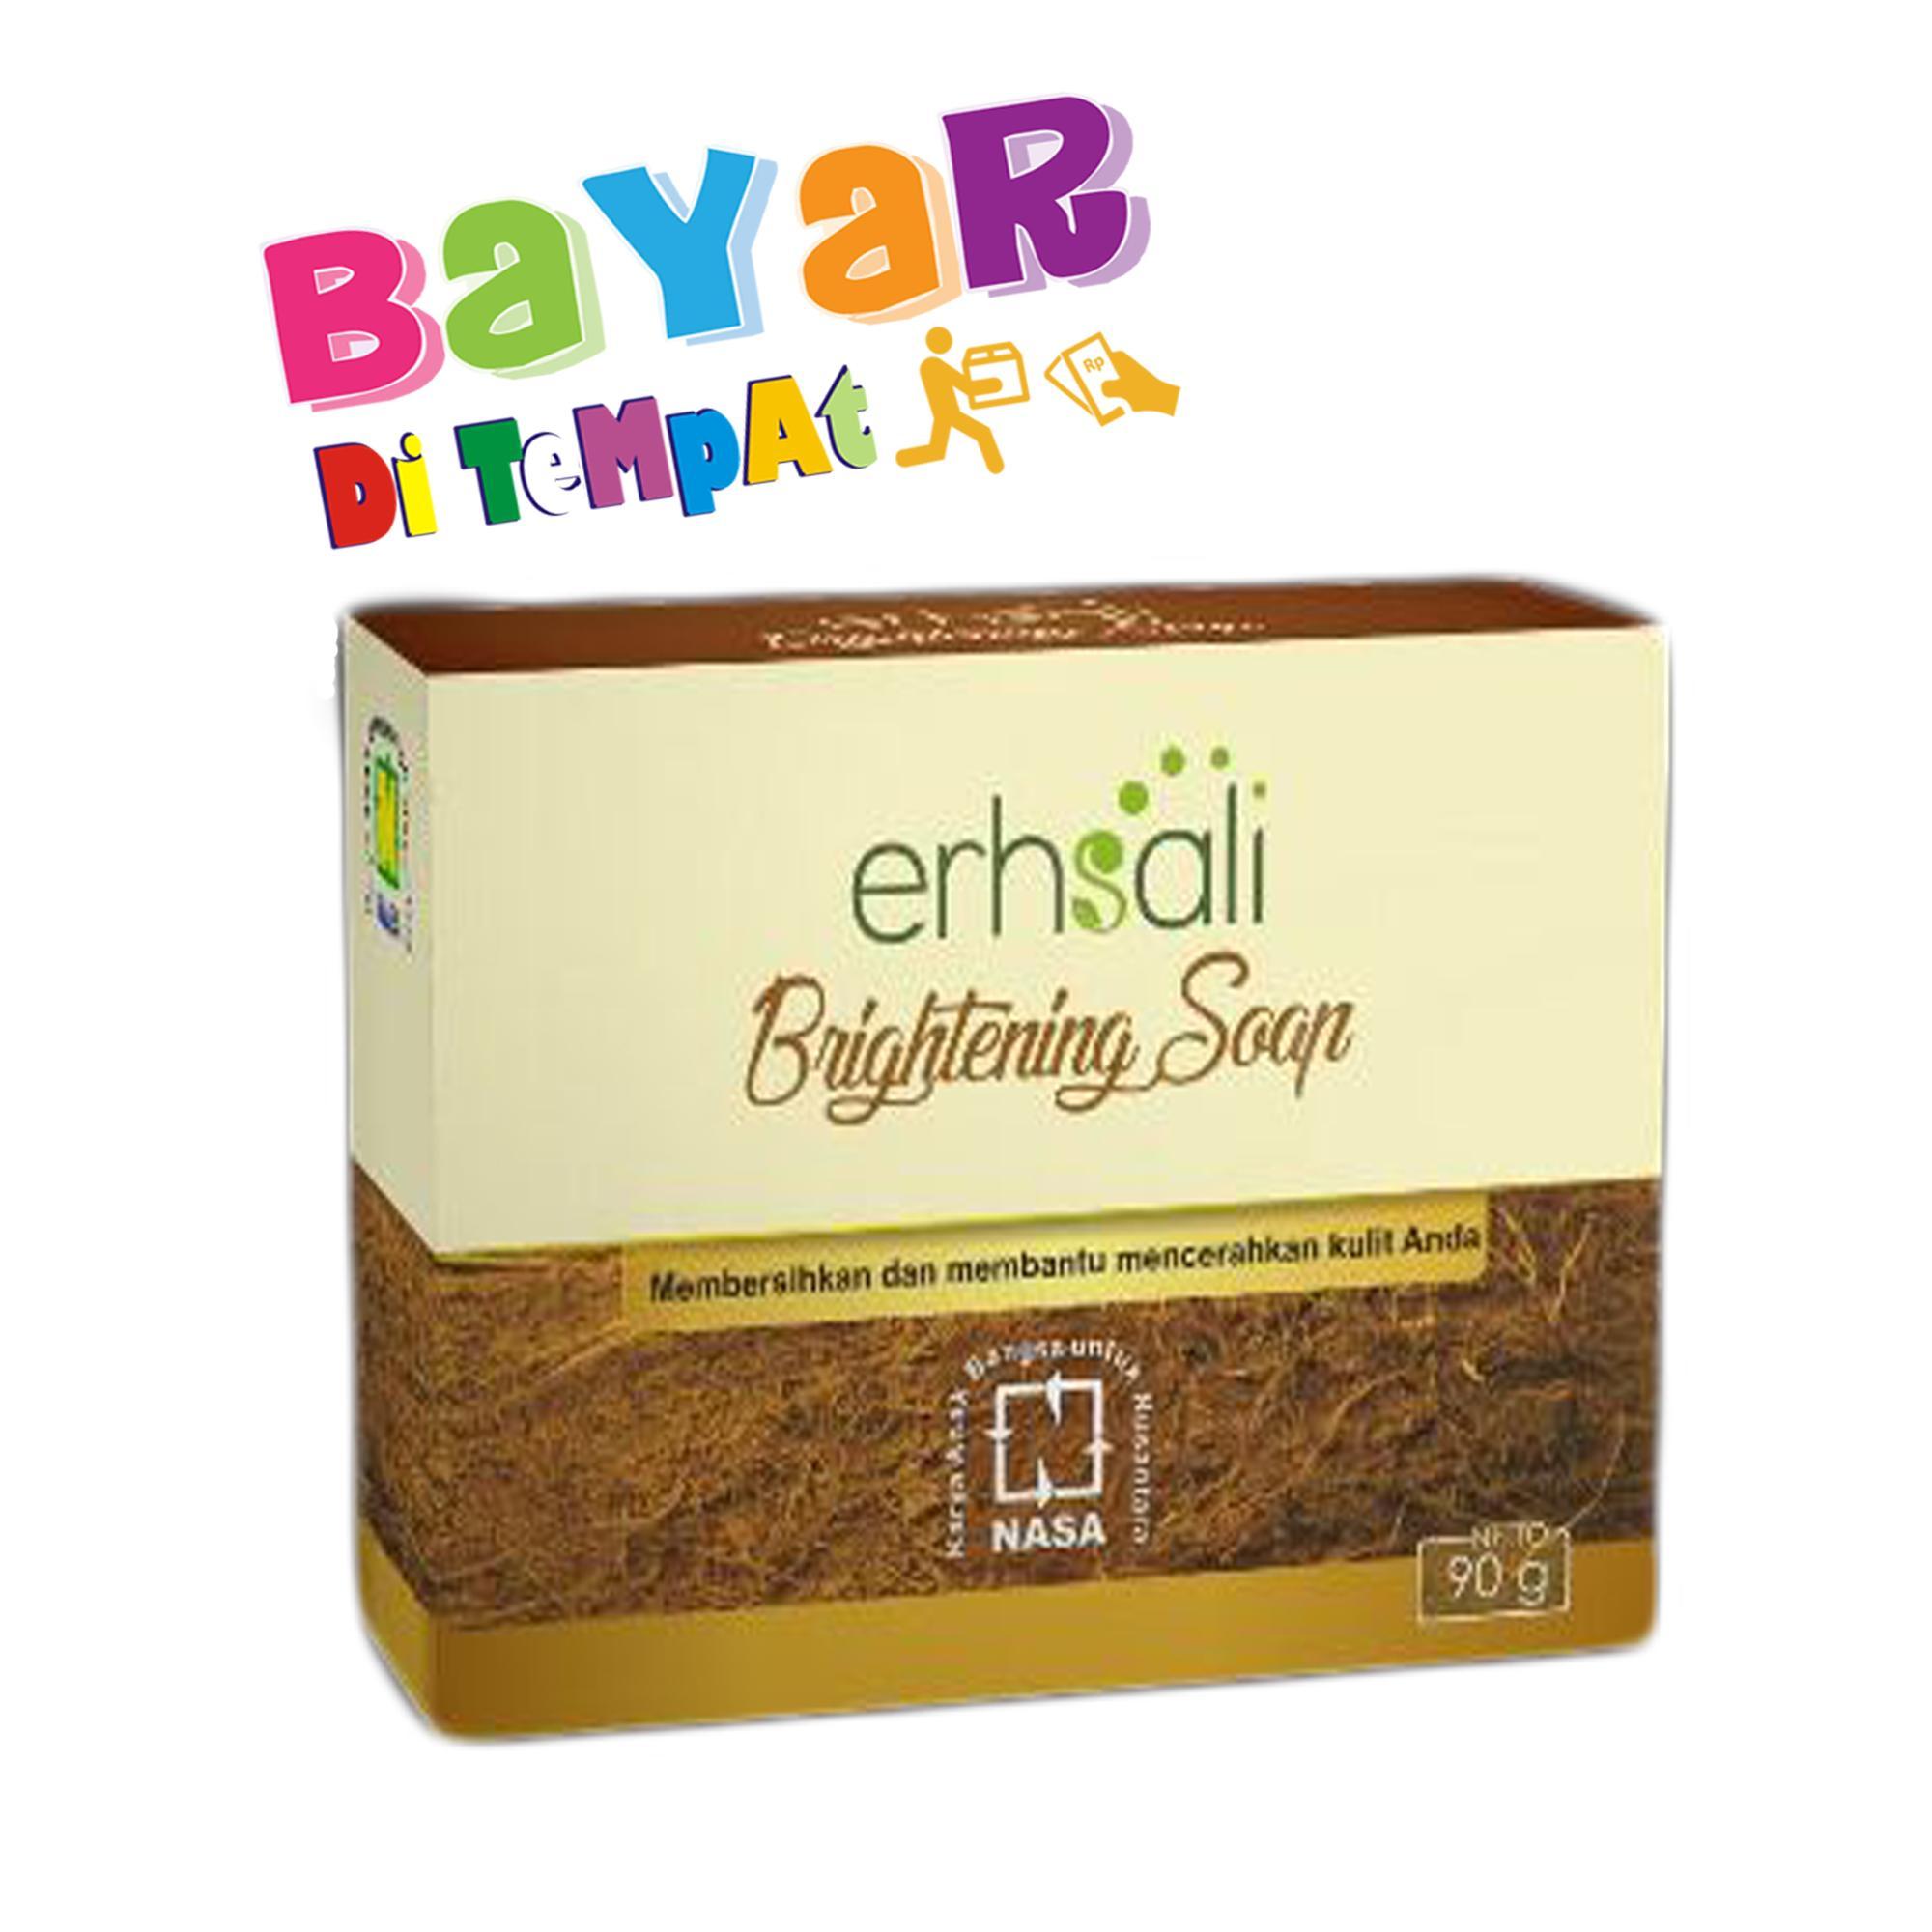 Ershali Brightening Soap